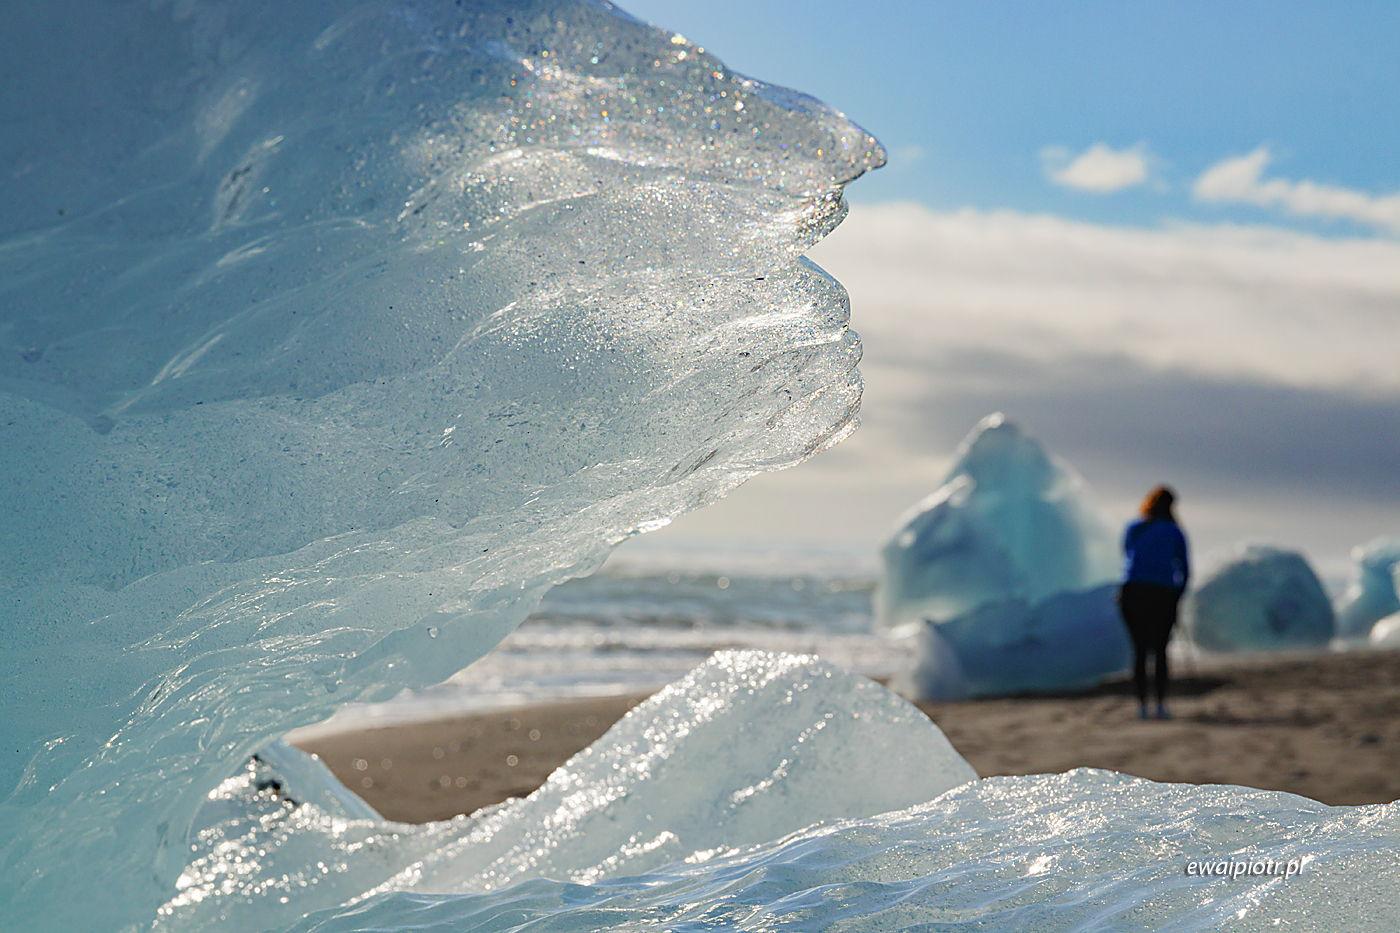 Lód na Diamentowej Plaży, Islandia